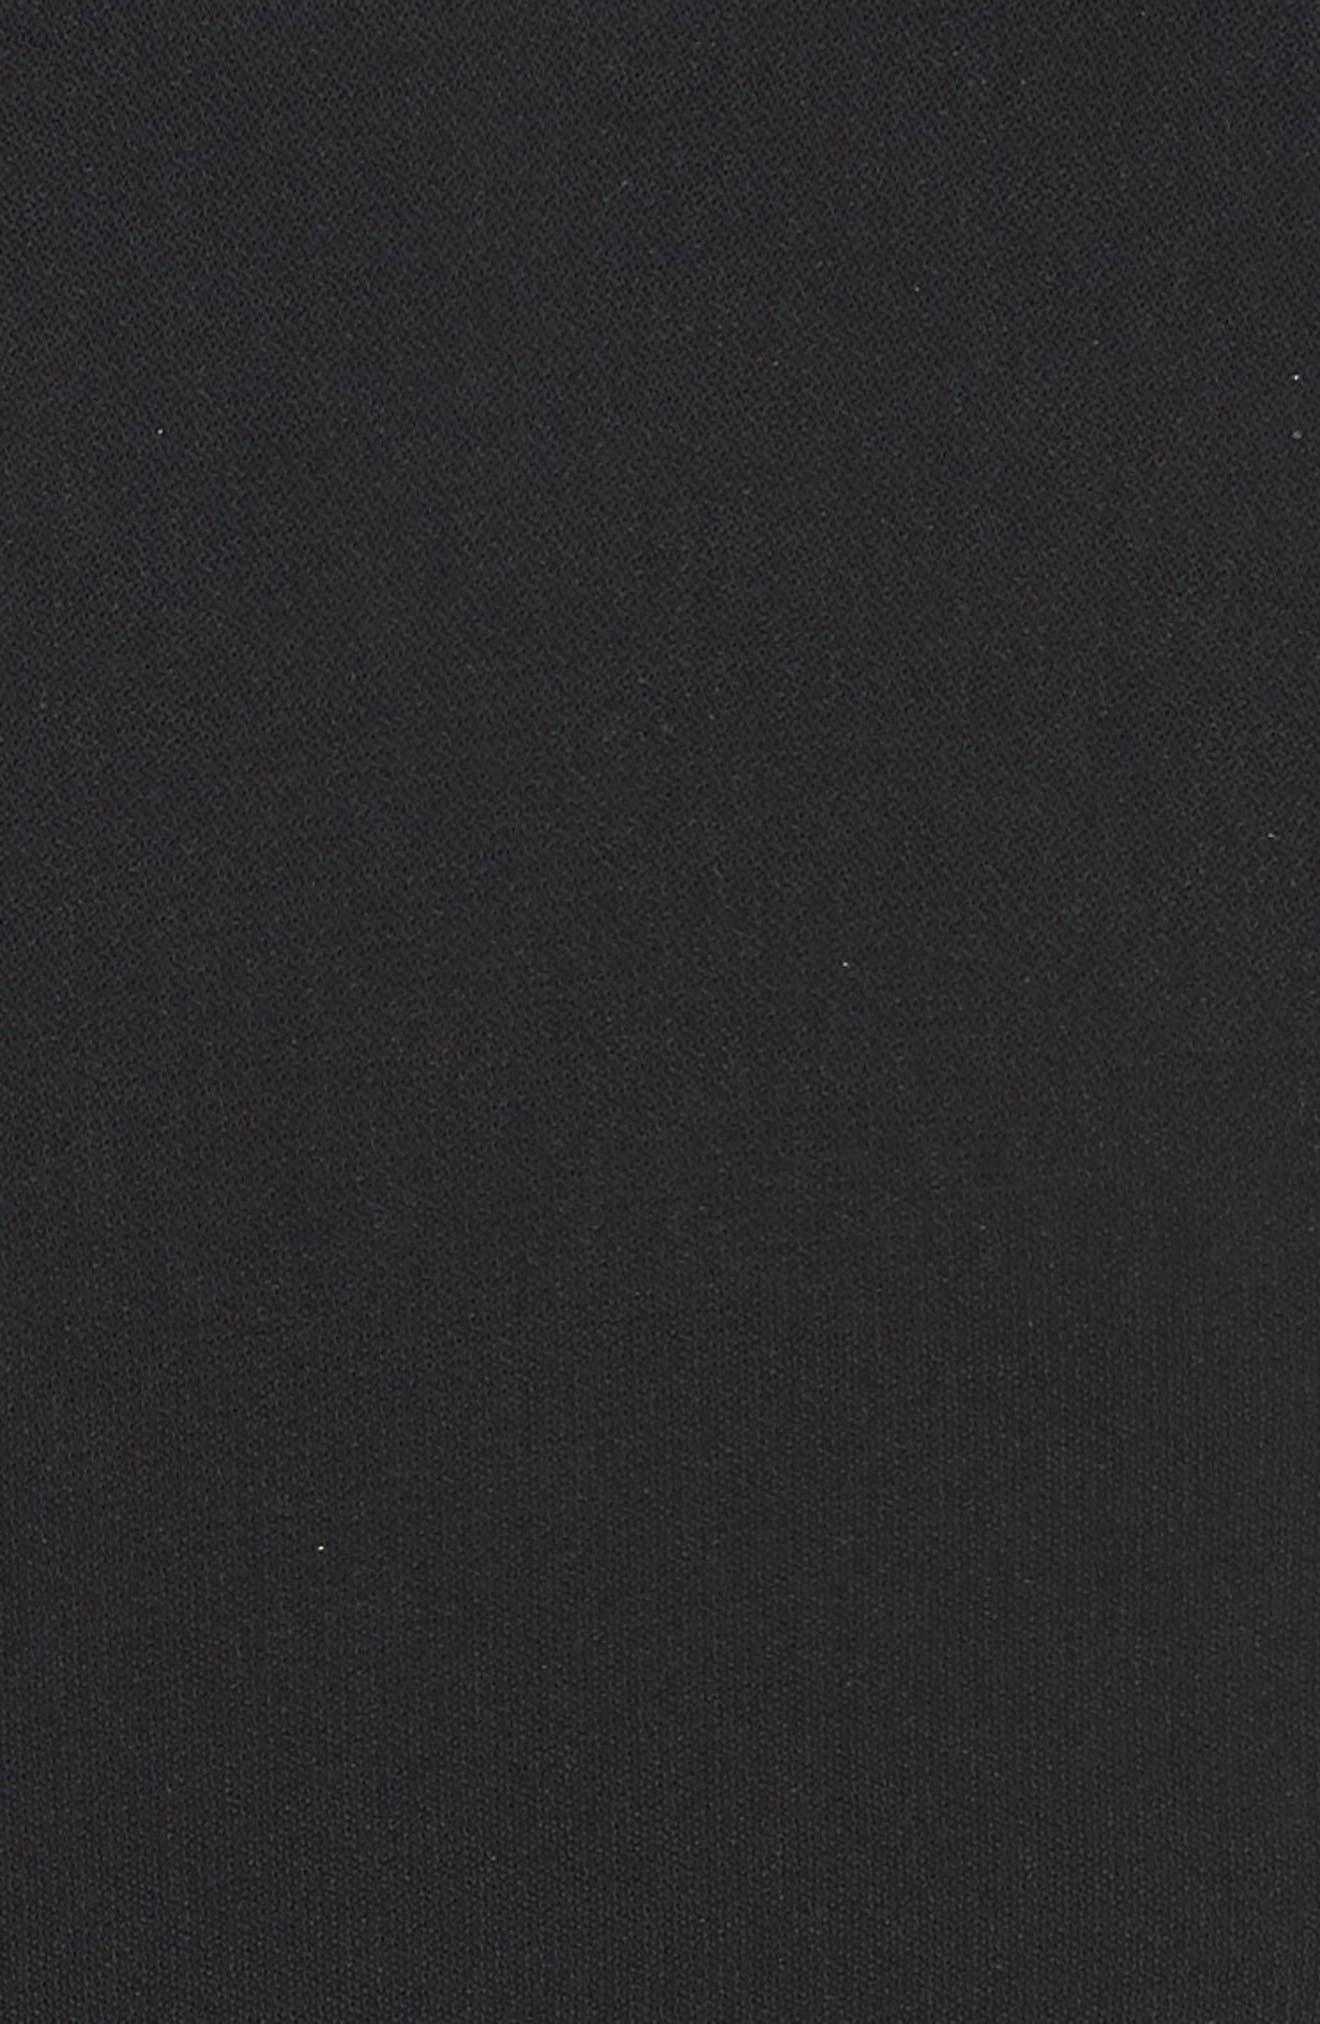 Zipper Detail Sheath Dress,                             Alternate thumbnail 5, color,                             001